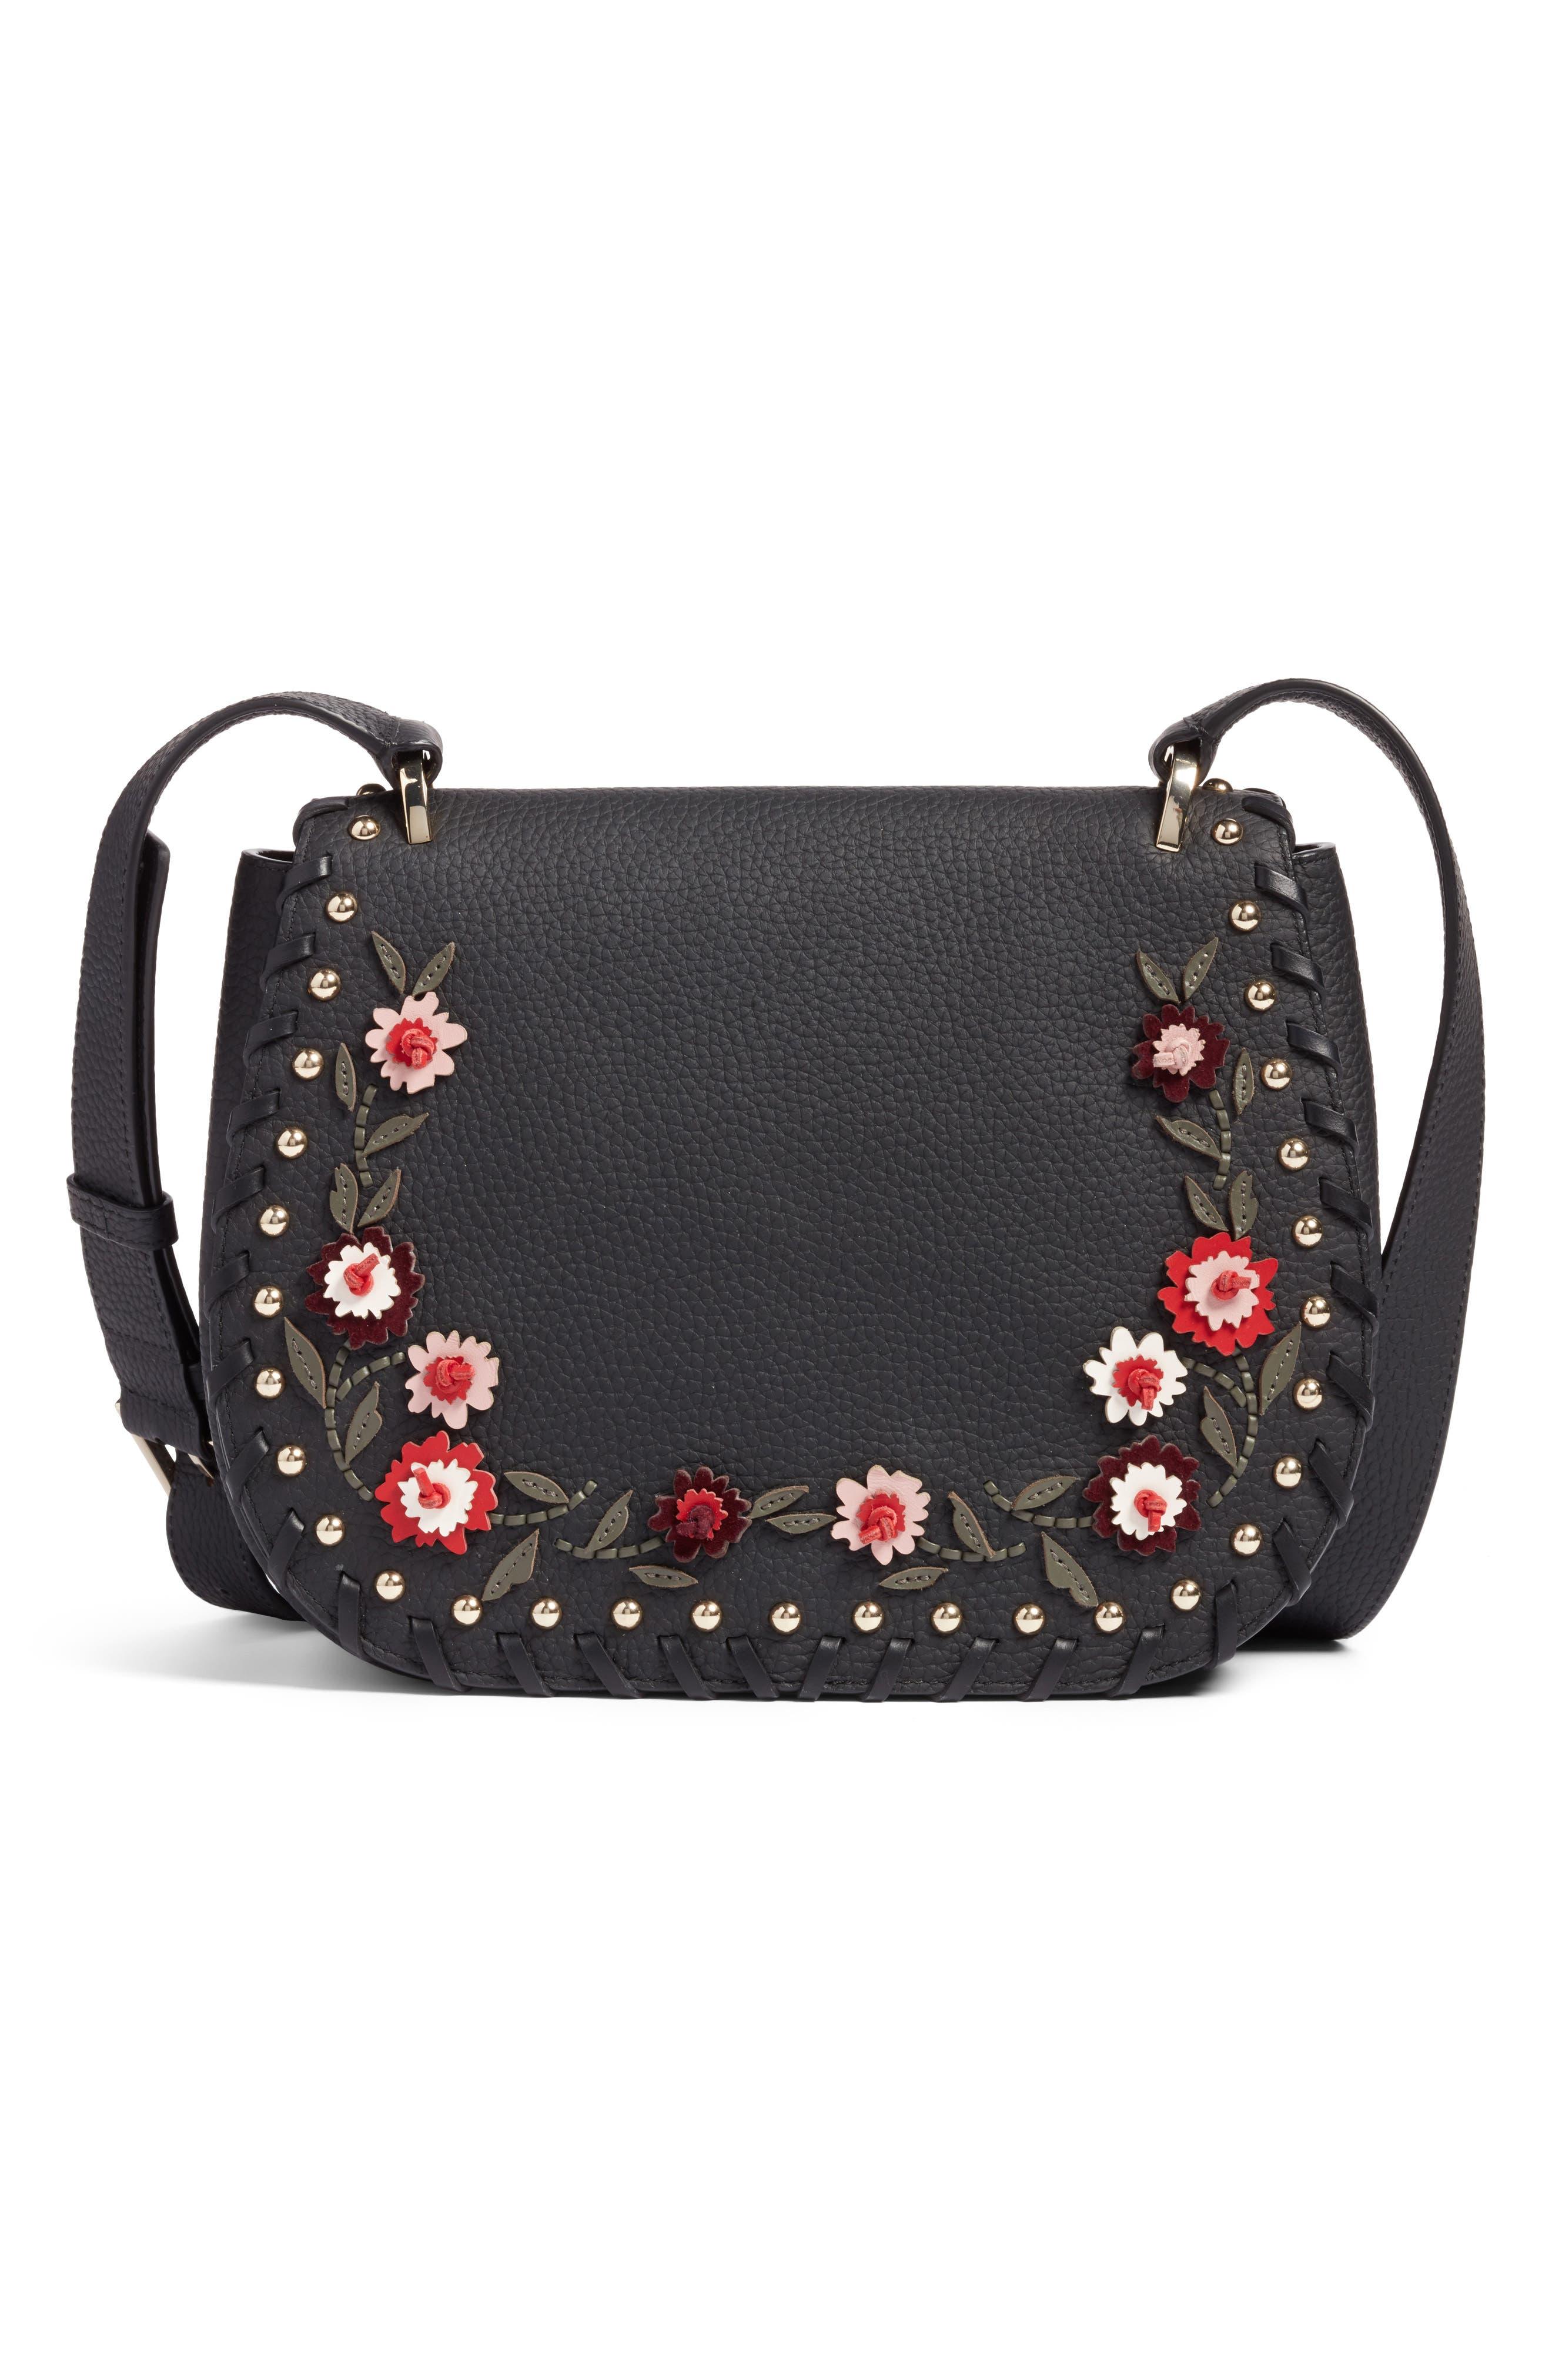 madison daniels drive - tressa embellished leather crossbody bag,                         Main,                         color, 001